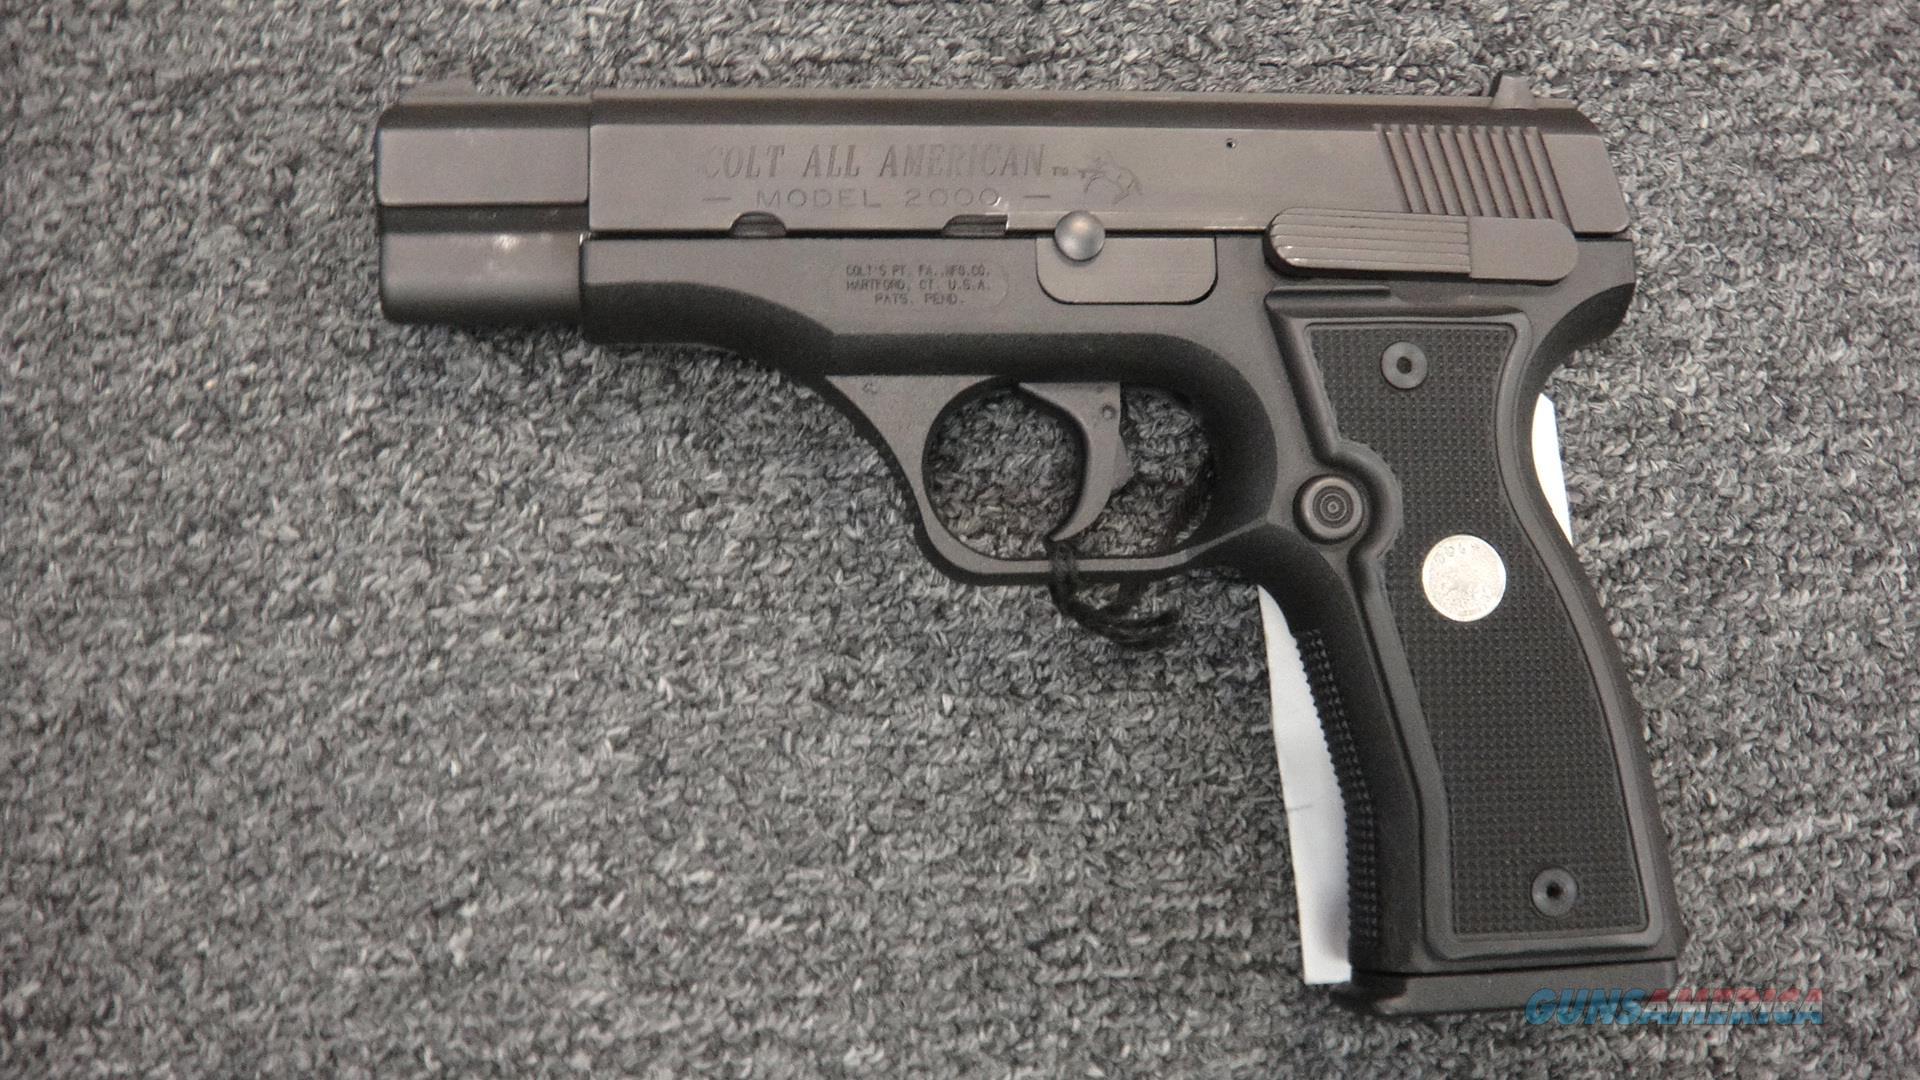 Colt American 2000 9mm  Guns > Pistols > Colt Automatic Pistols (.25, .32, & .380 cal)